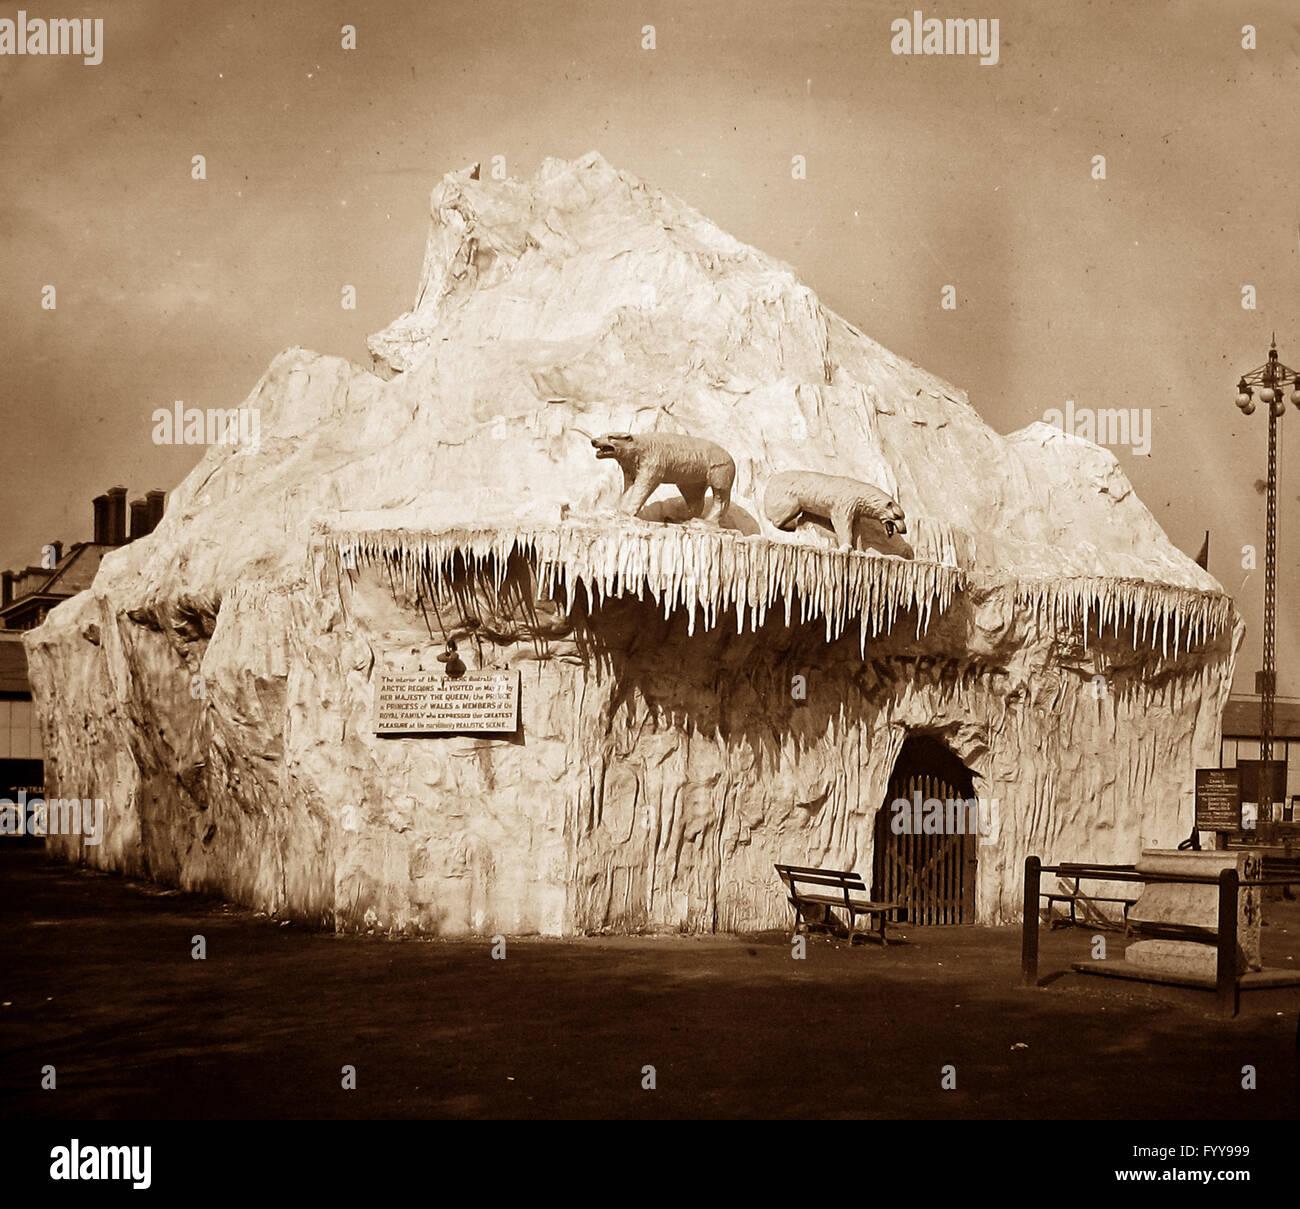 Royal Naval Exhibition 1891 - The Iceberg Stock Photo